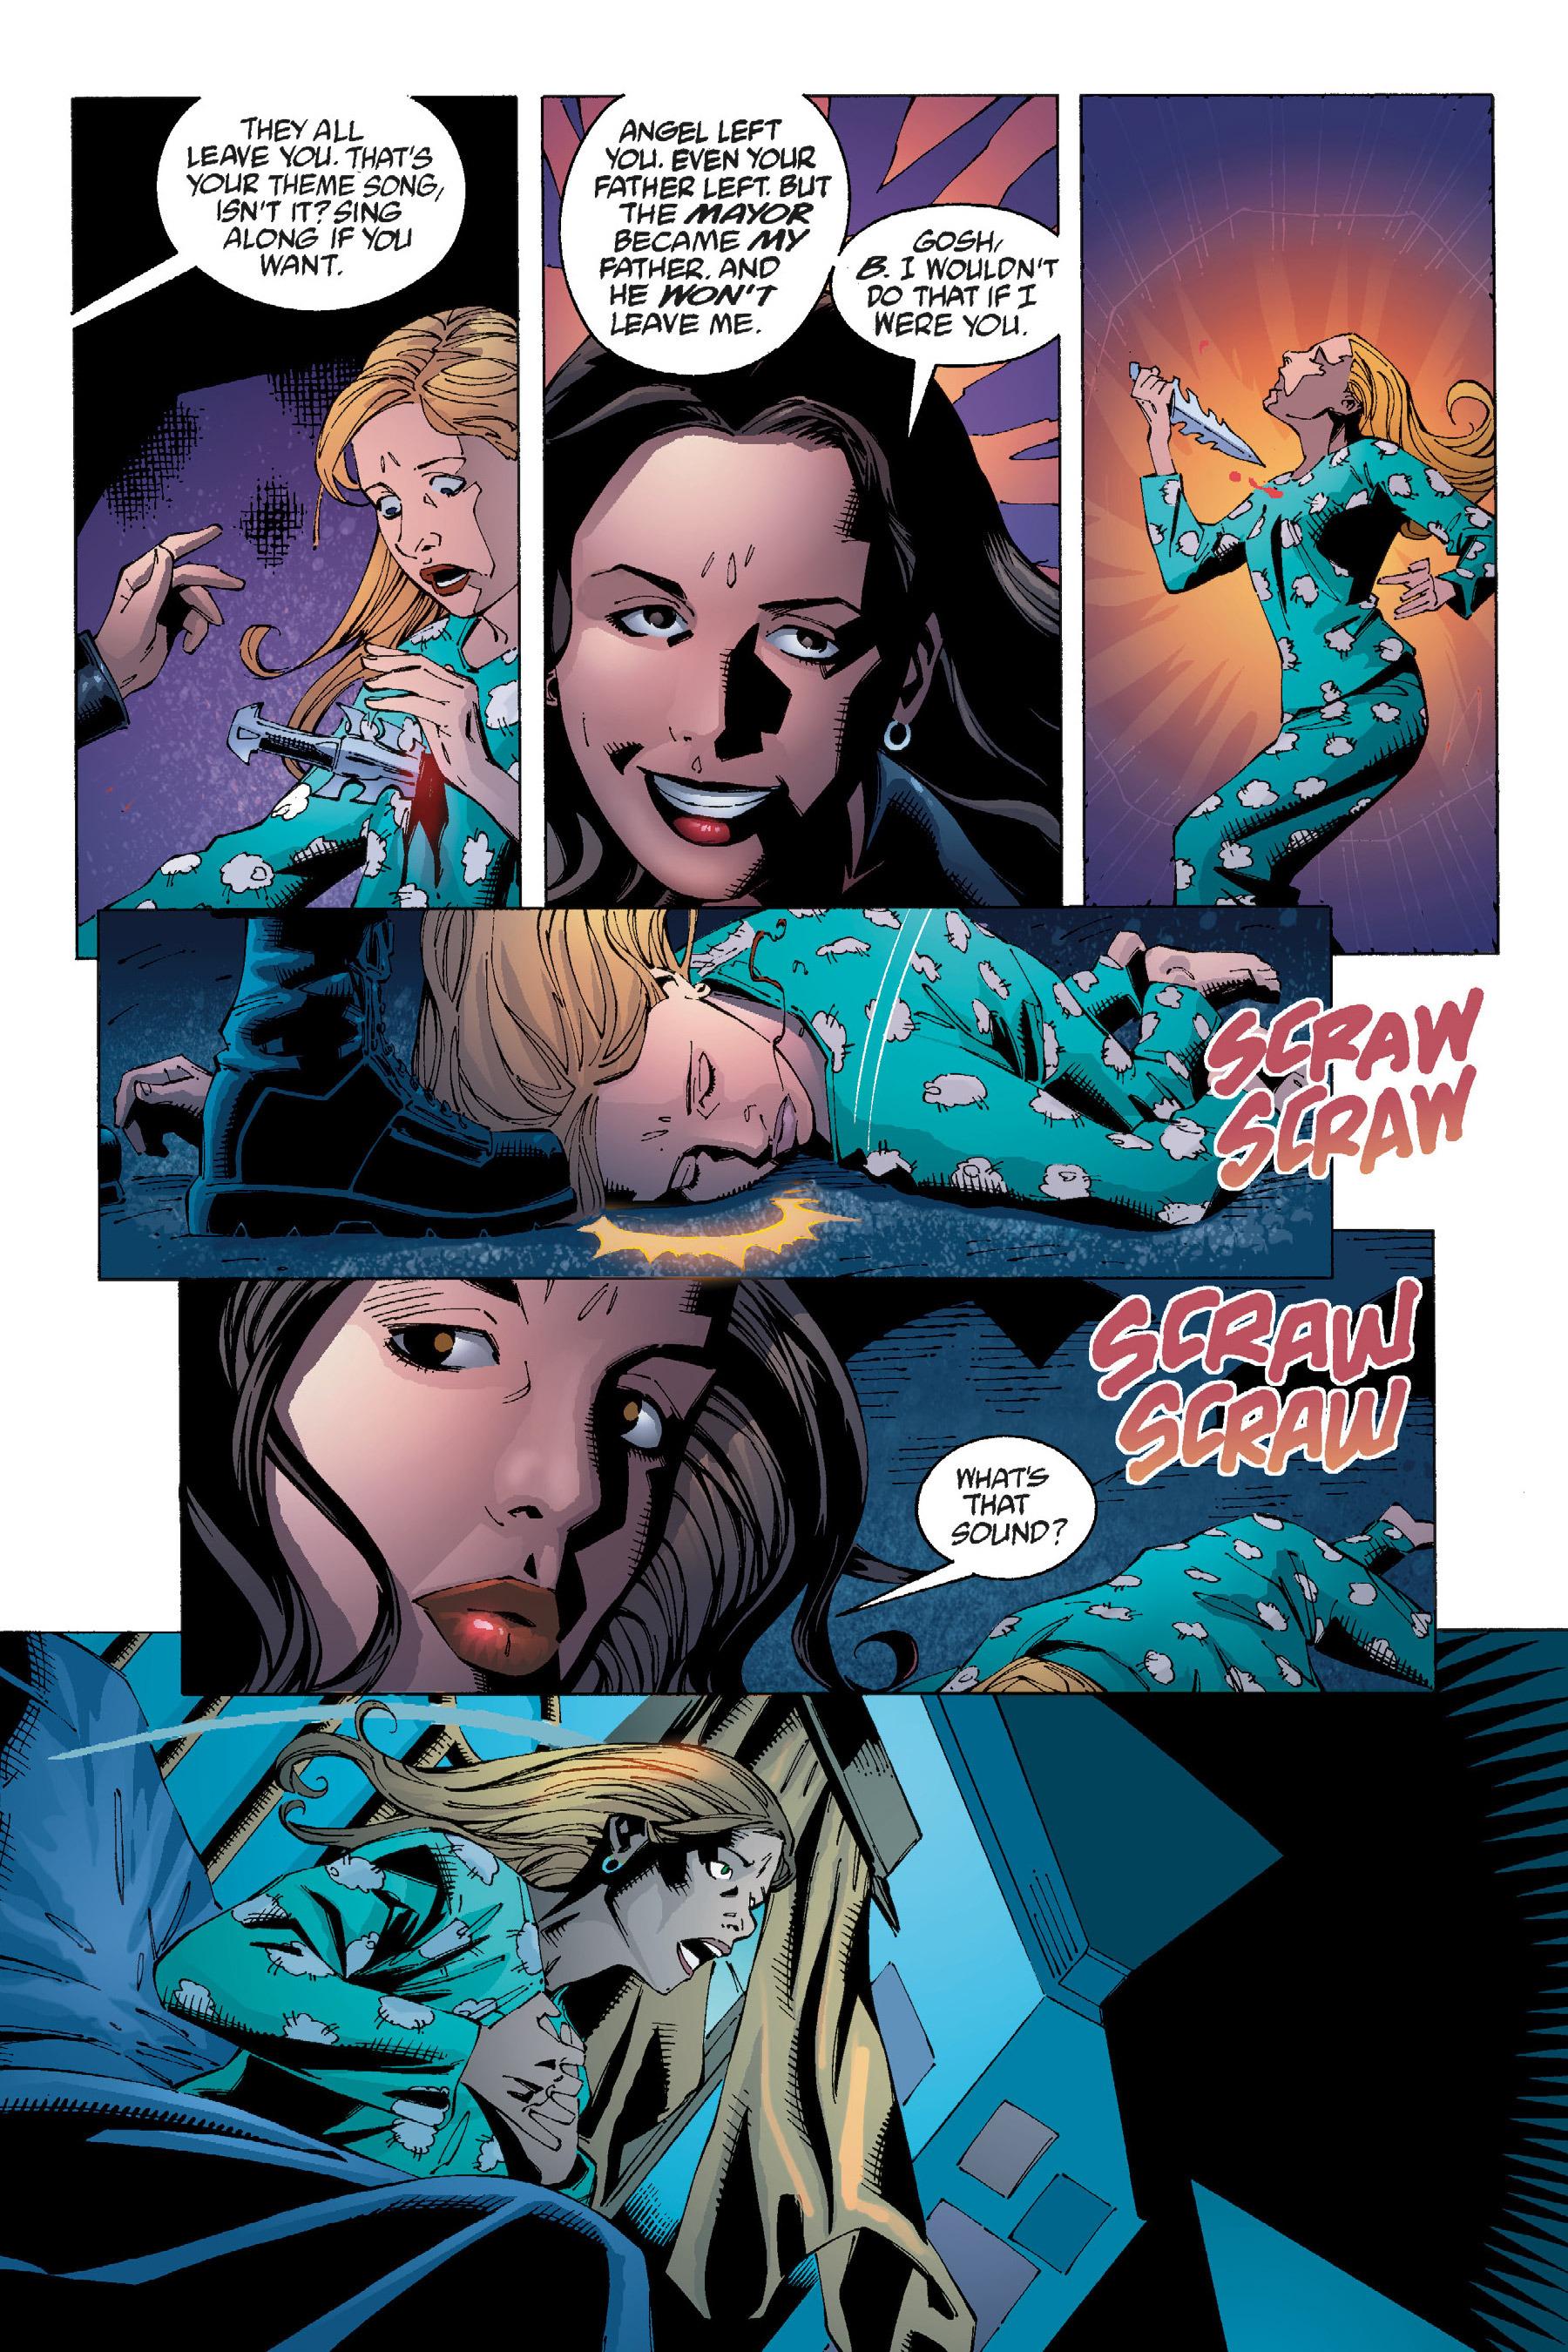 Read online Buffy the Vampire Slayer: Omnibus comic -  Issue # TPB 5 - 15